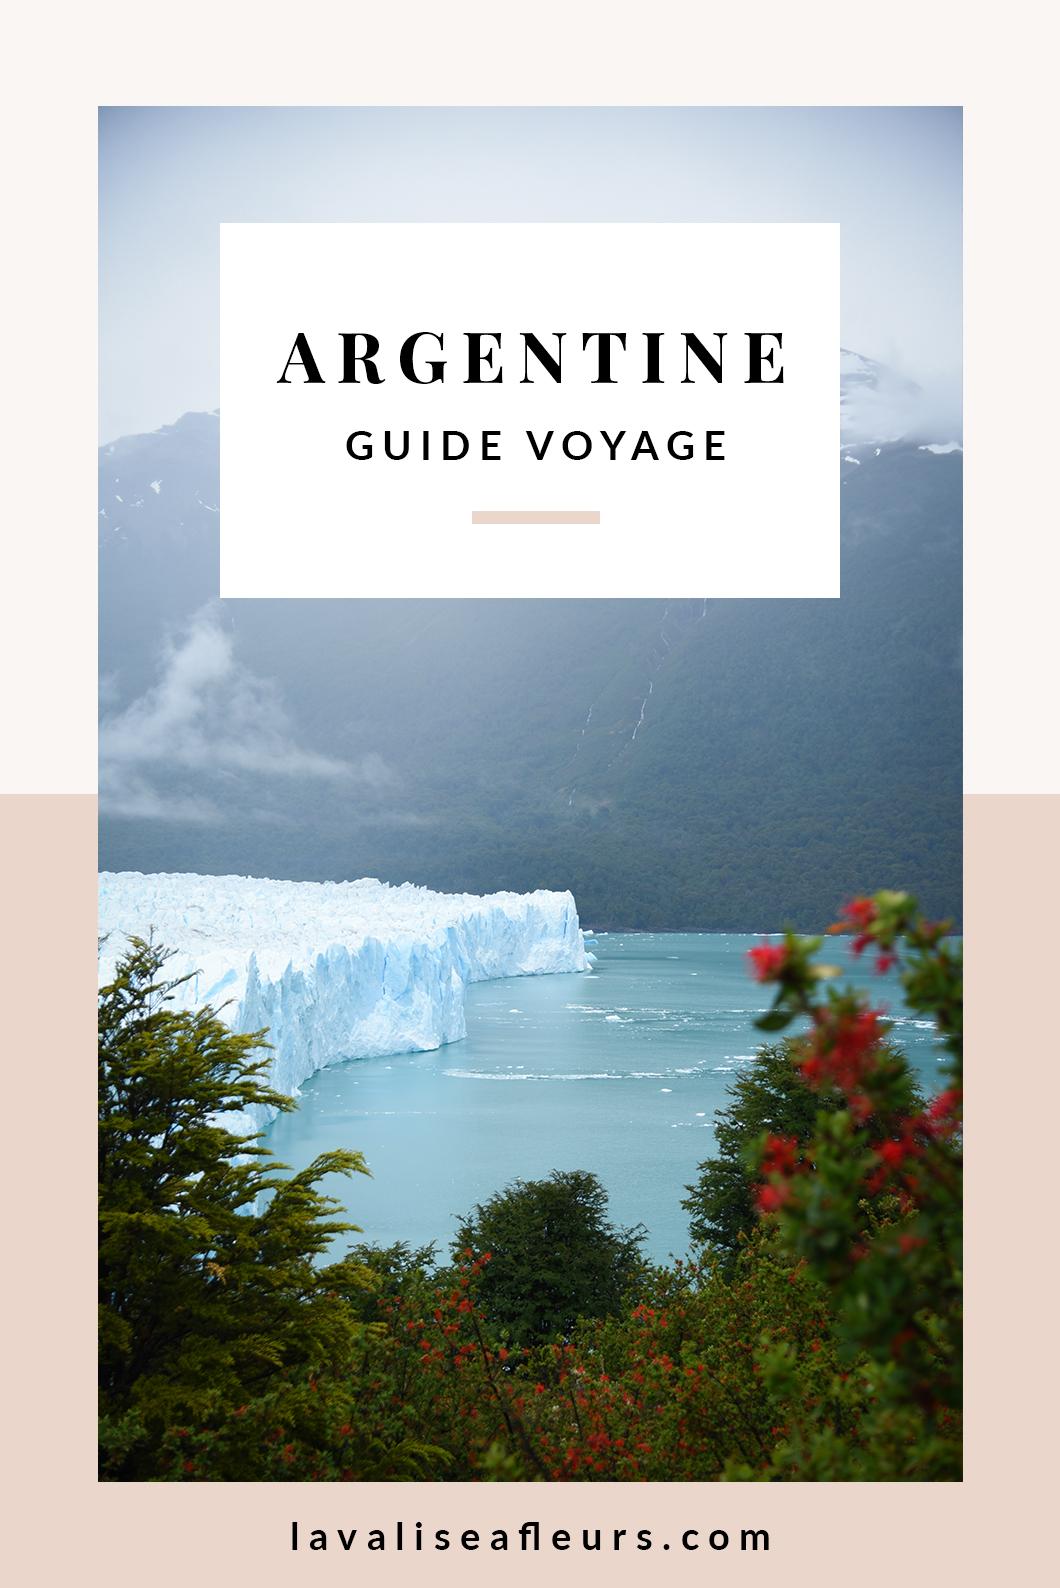 Guide voyage en Argentine